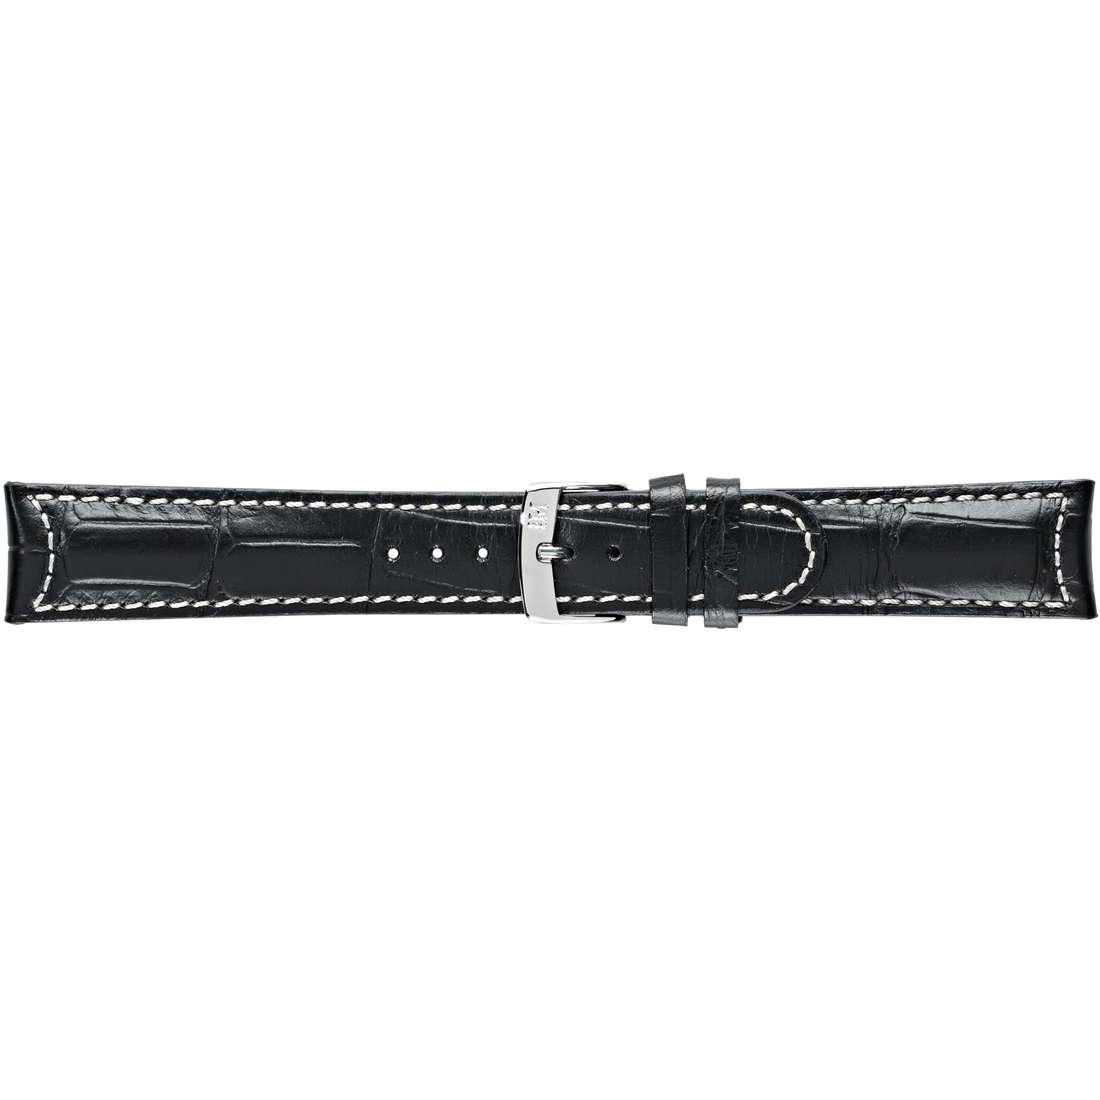 watch watch bands watch straps man Morellato Manufatti A01U3882A59019CR20